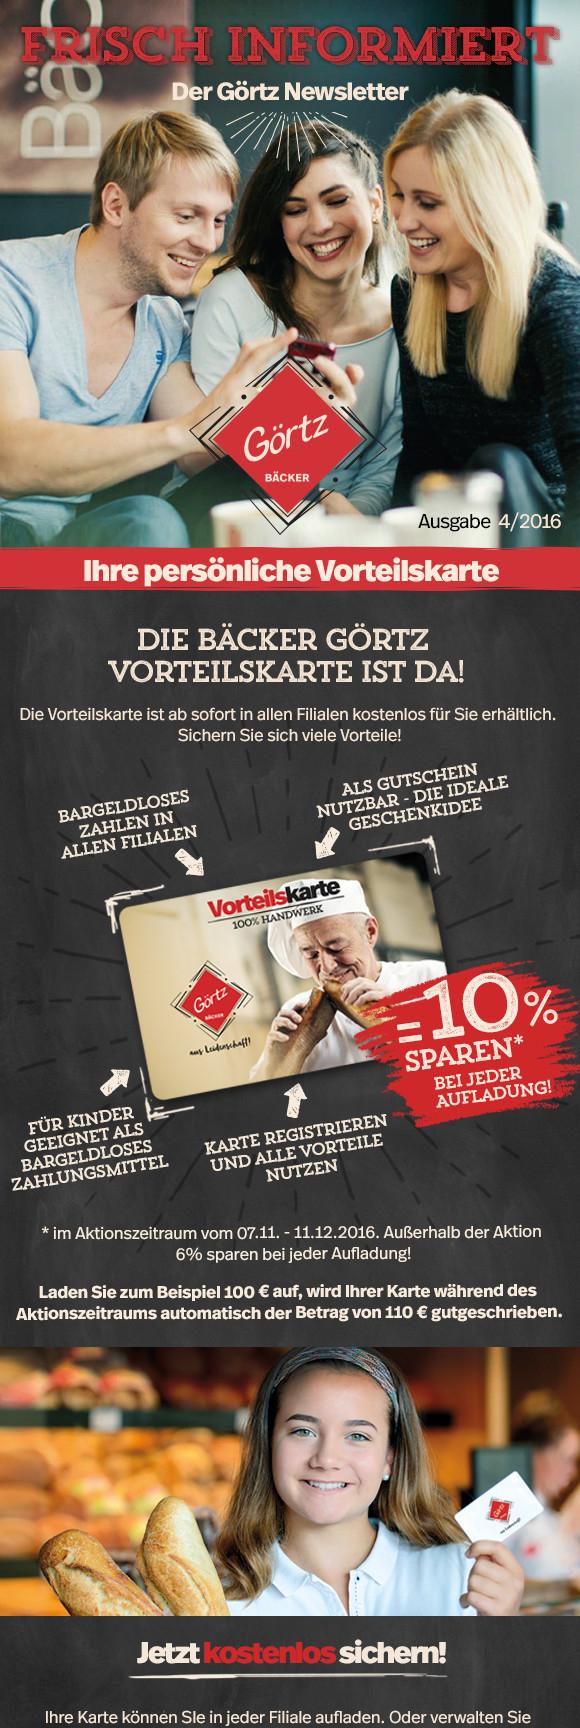 Ludwigshafen + Umgebung, Bäcker Görtz 10% sparen